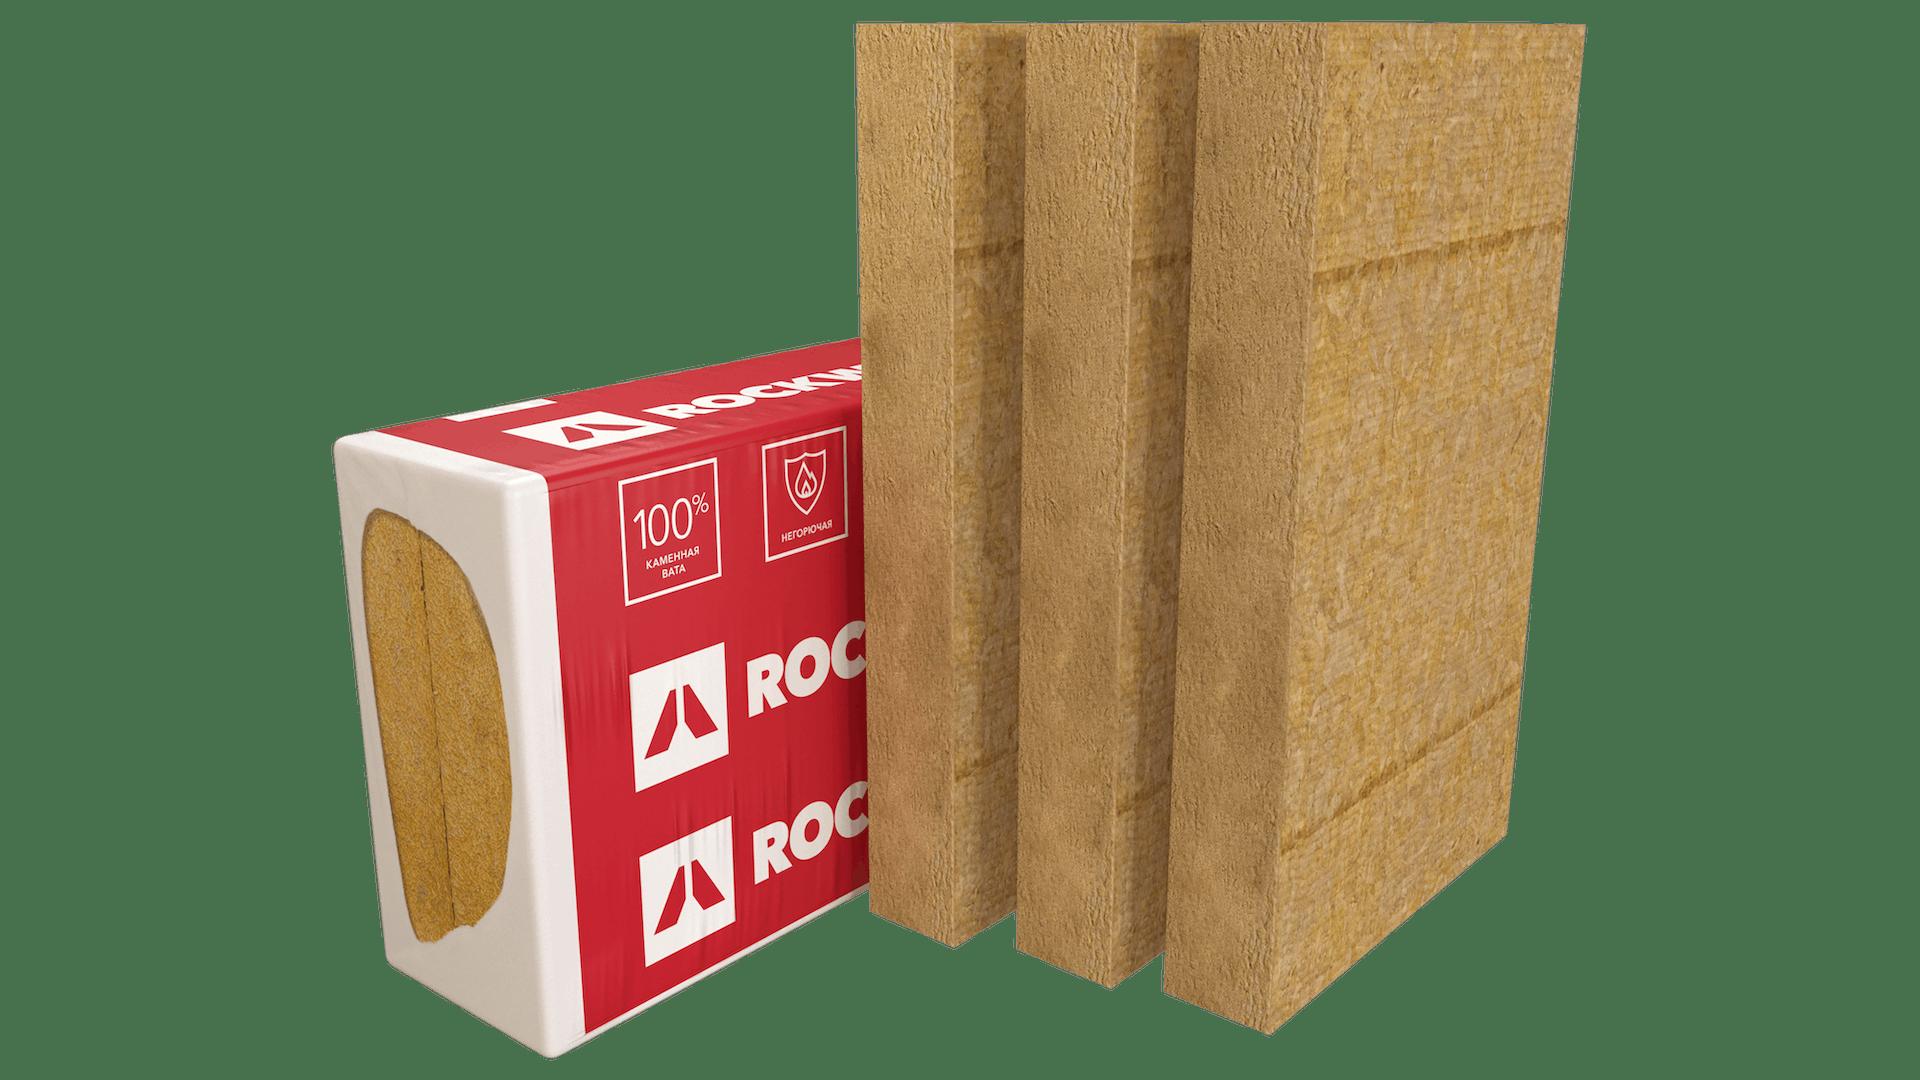 RUF BATTS D EXTRA, RUF BATTS, roof, roof insulation